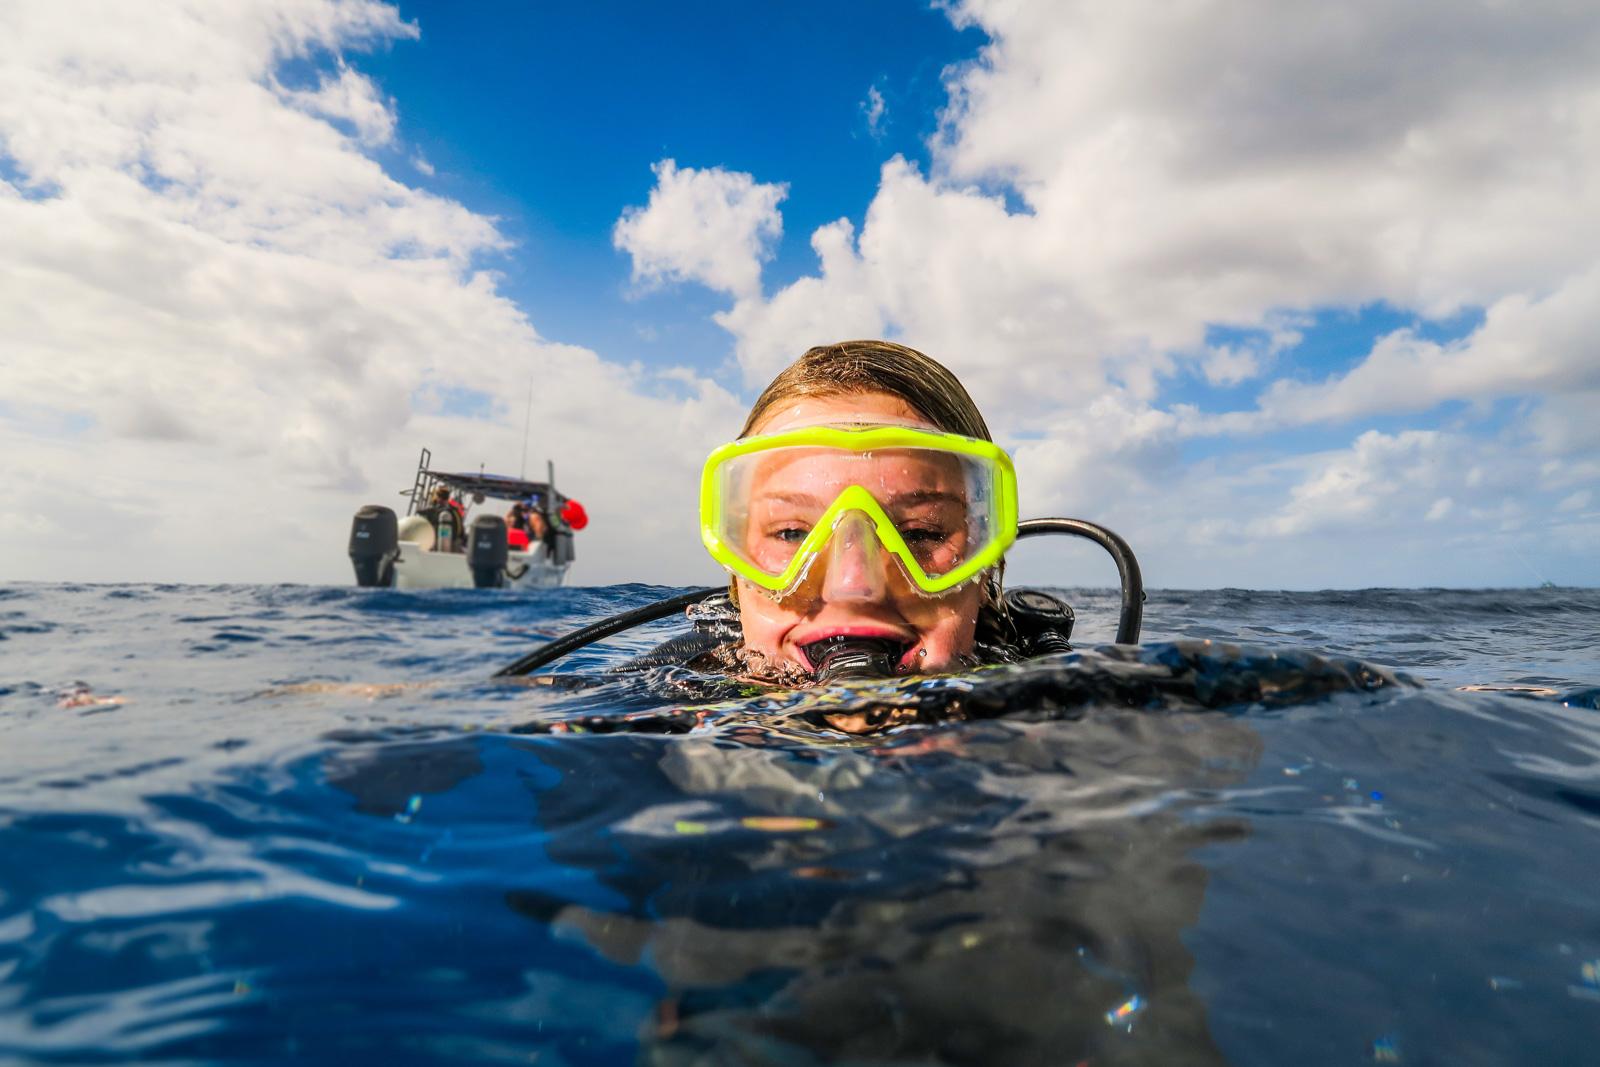 Scuba life cozumel diving i scuba diving in cozumel mexico - Cozumel dive sites ...